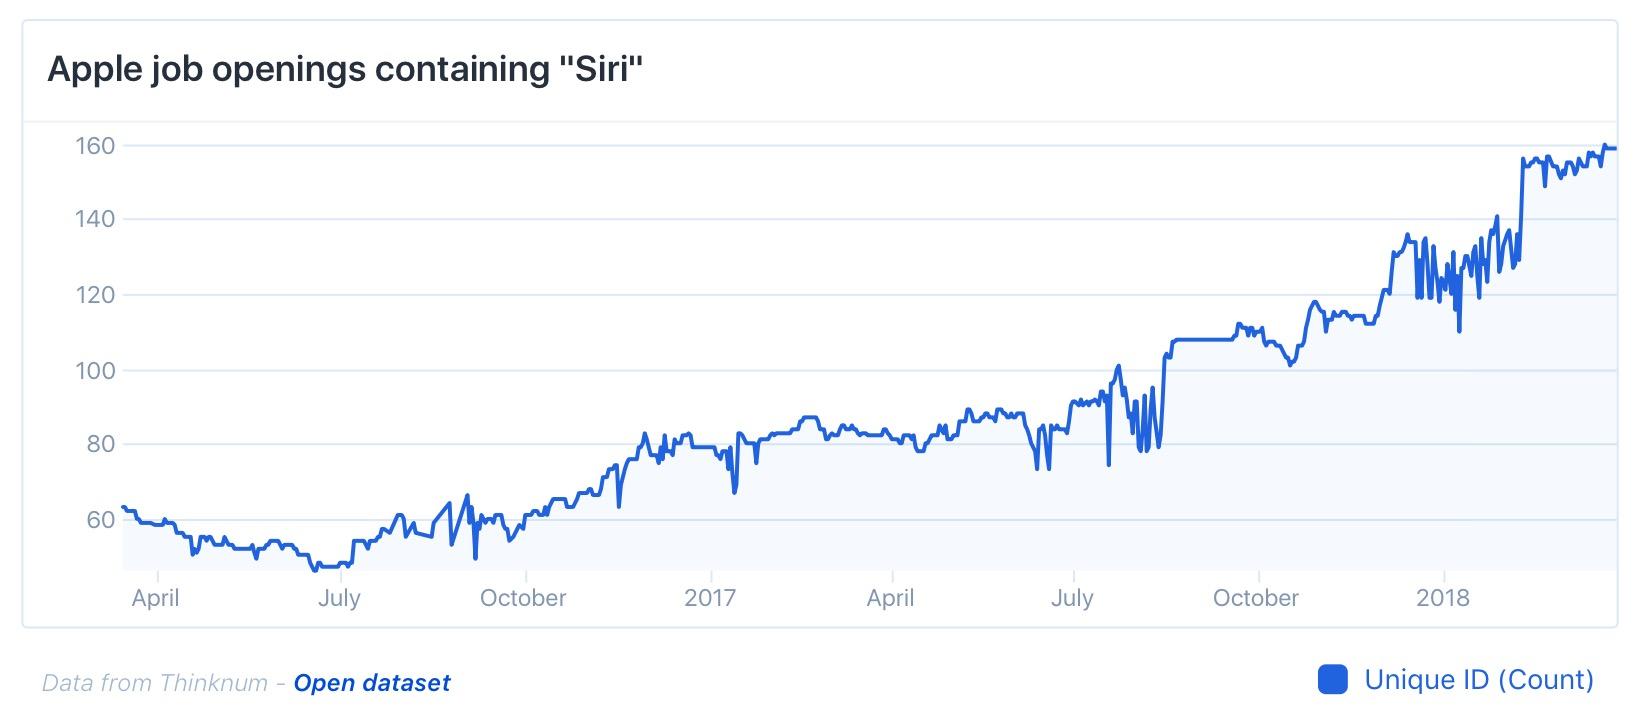 Vagas com o termo Siri